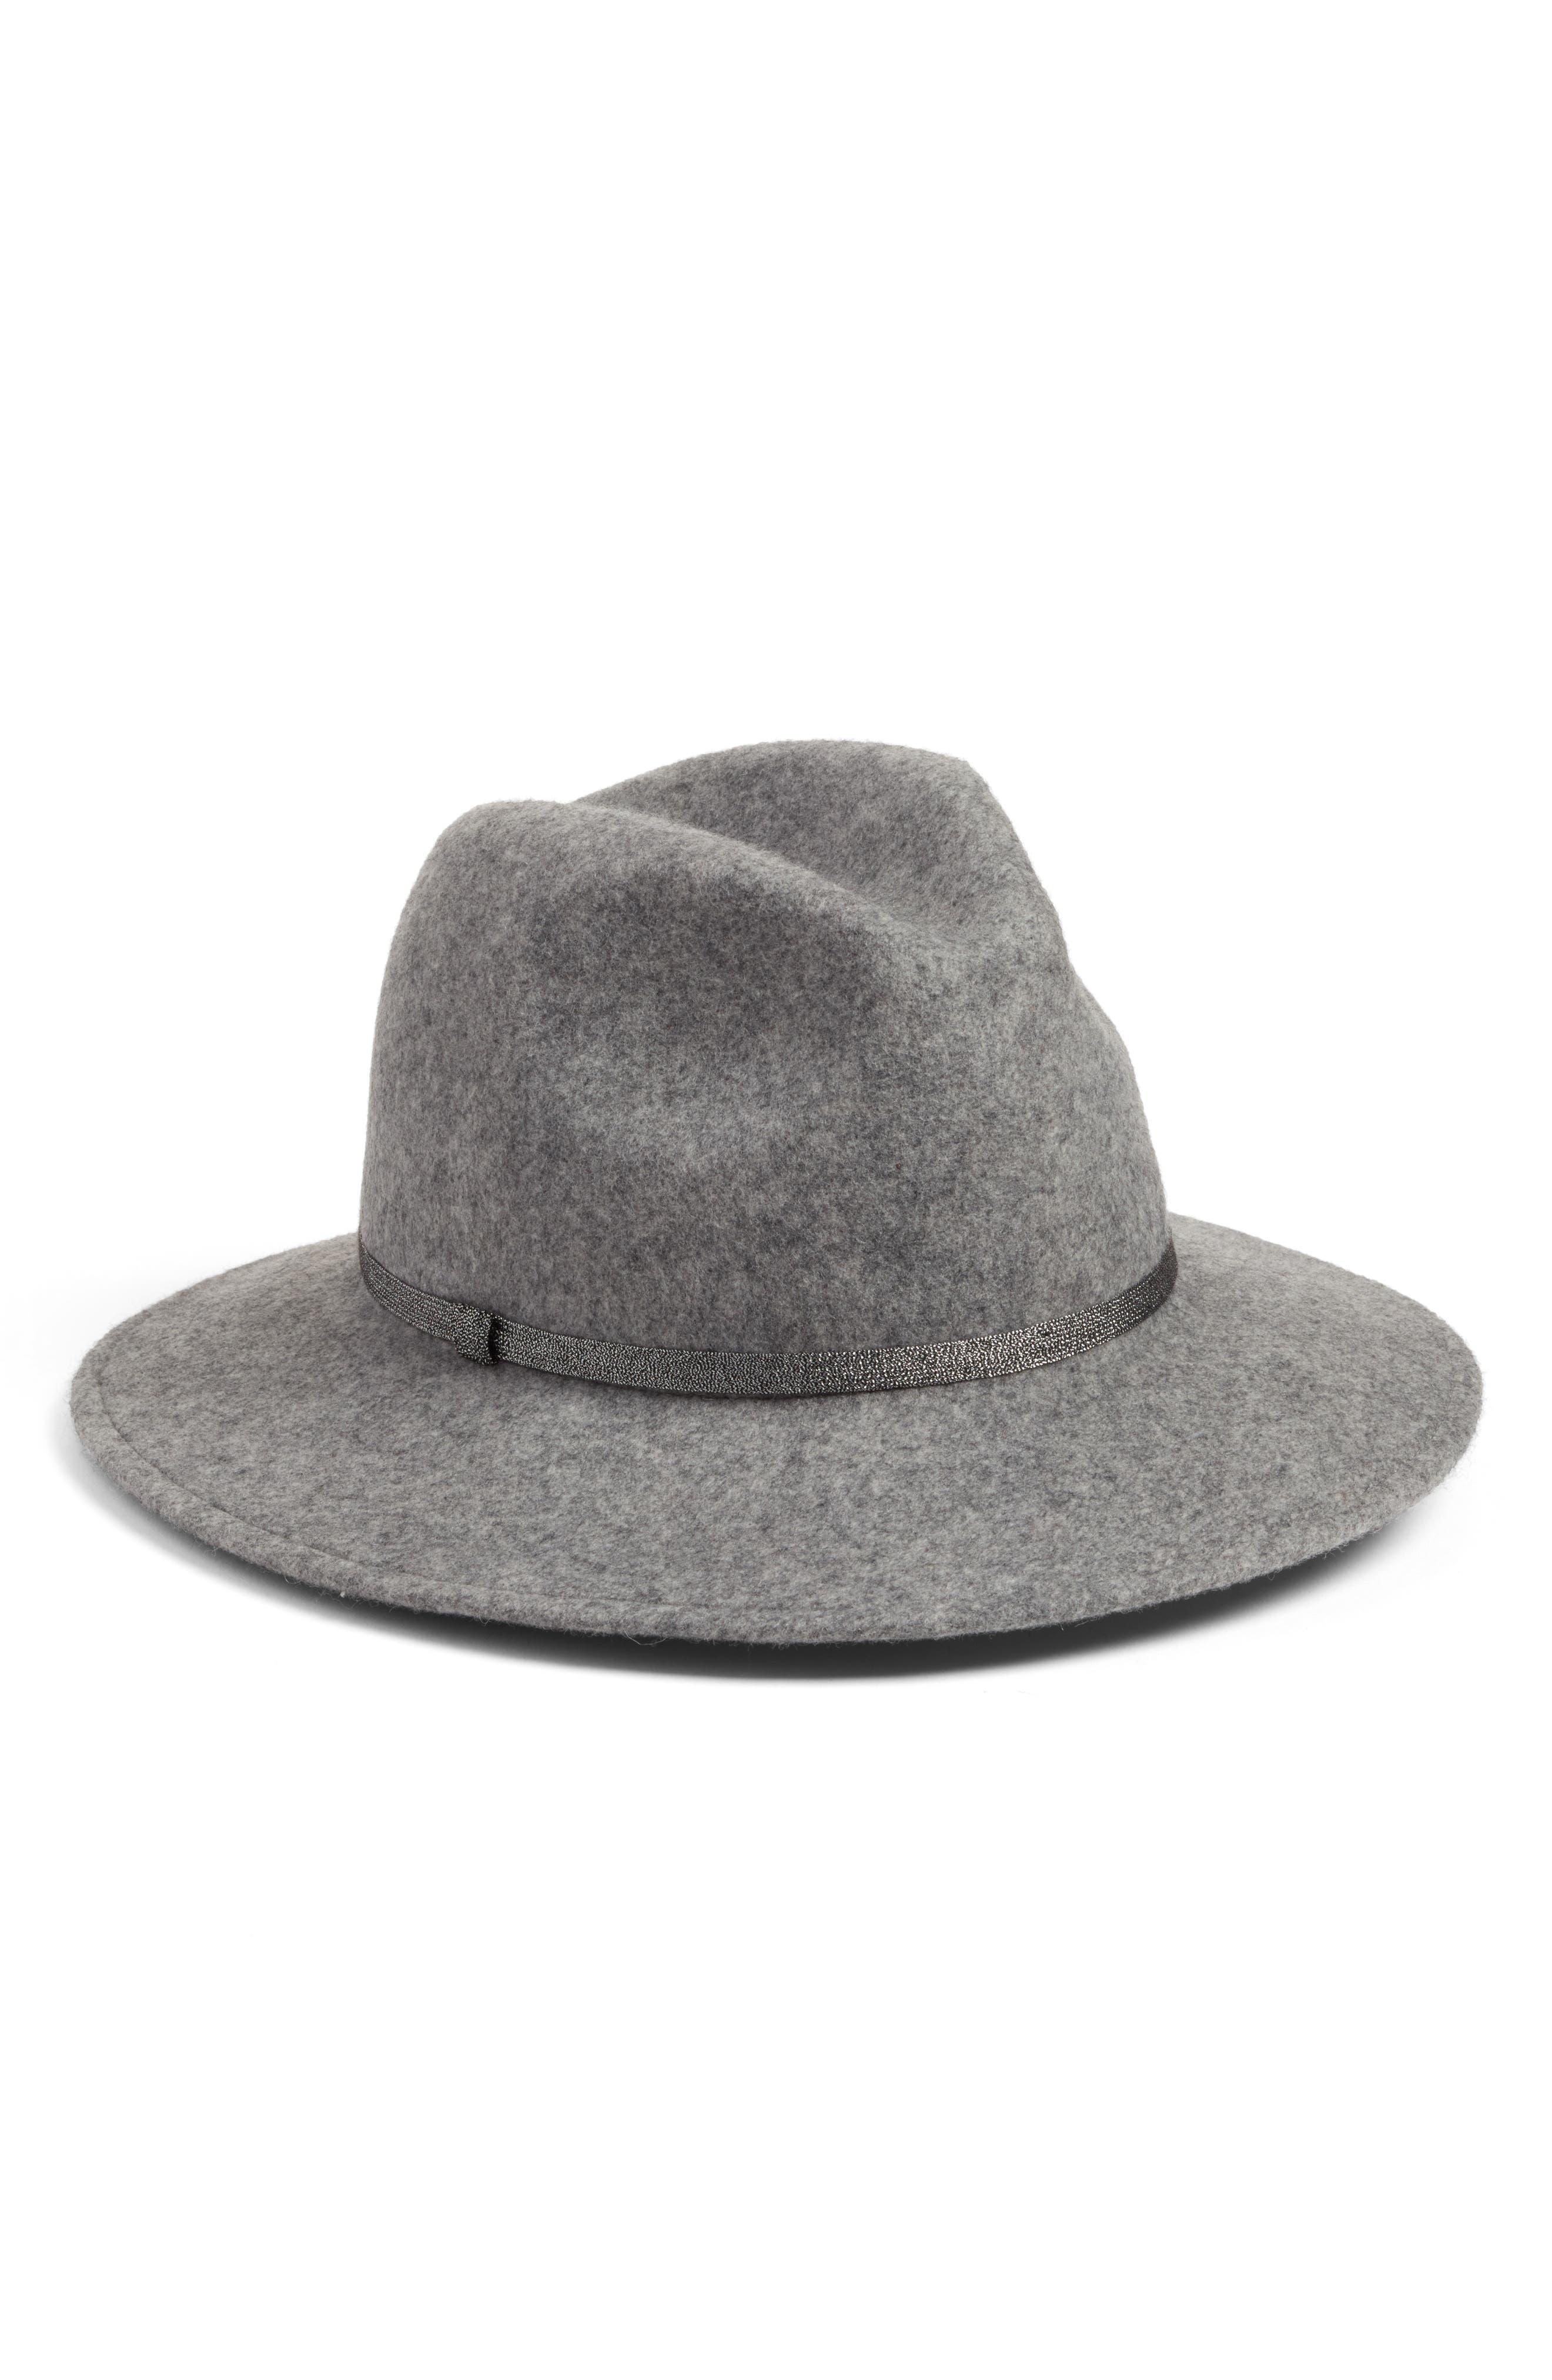 Metallic Band Wool Felt Panama Hat,                         Main,                         color, Grey Light Heather